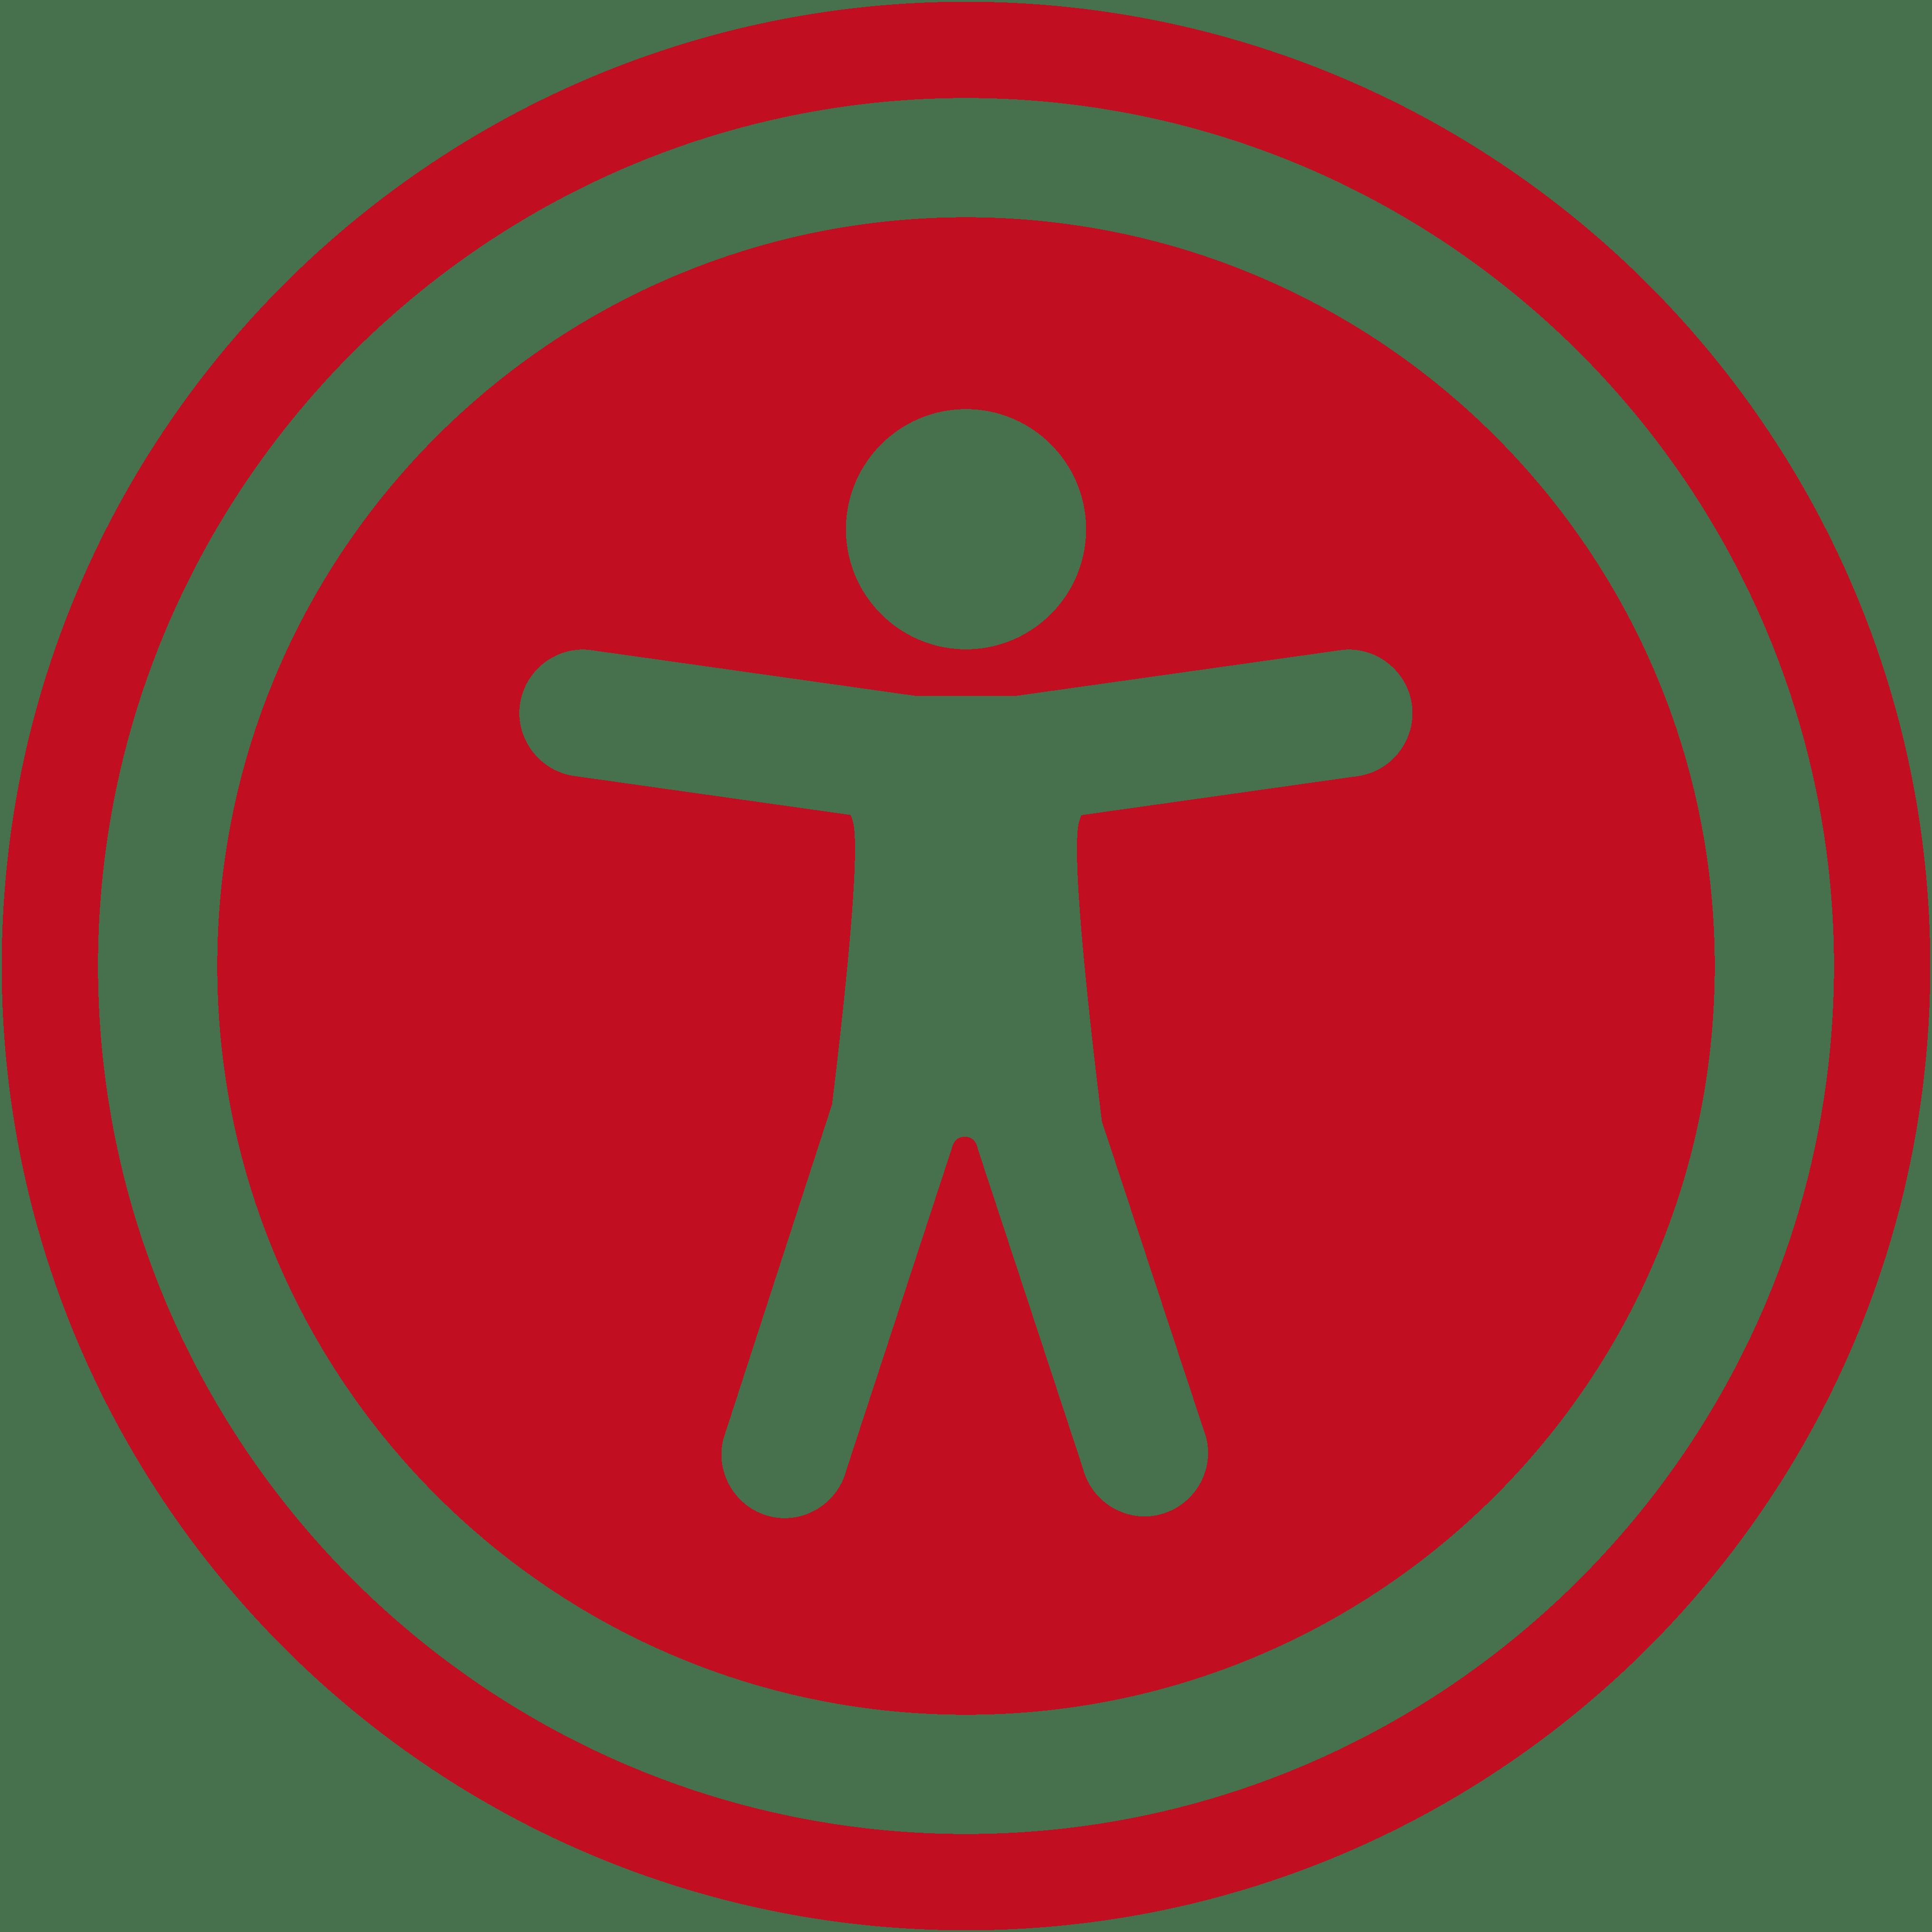 figura humana dentro de un círculo